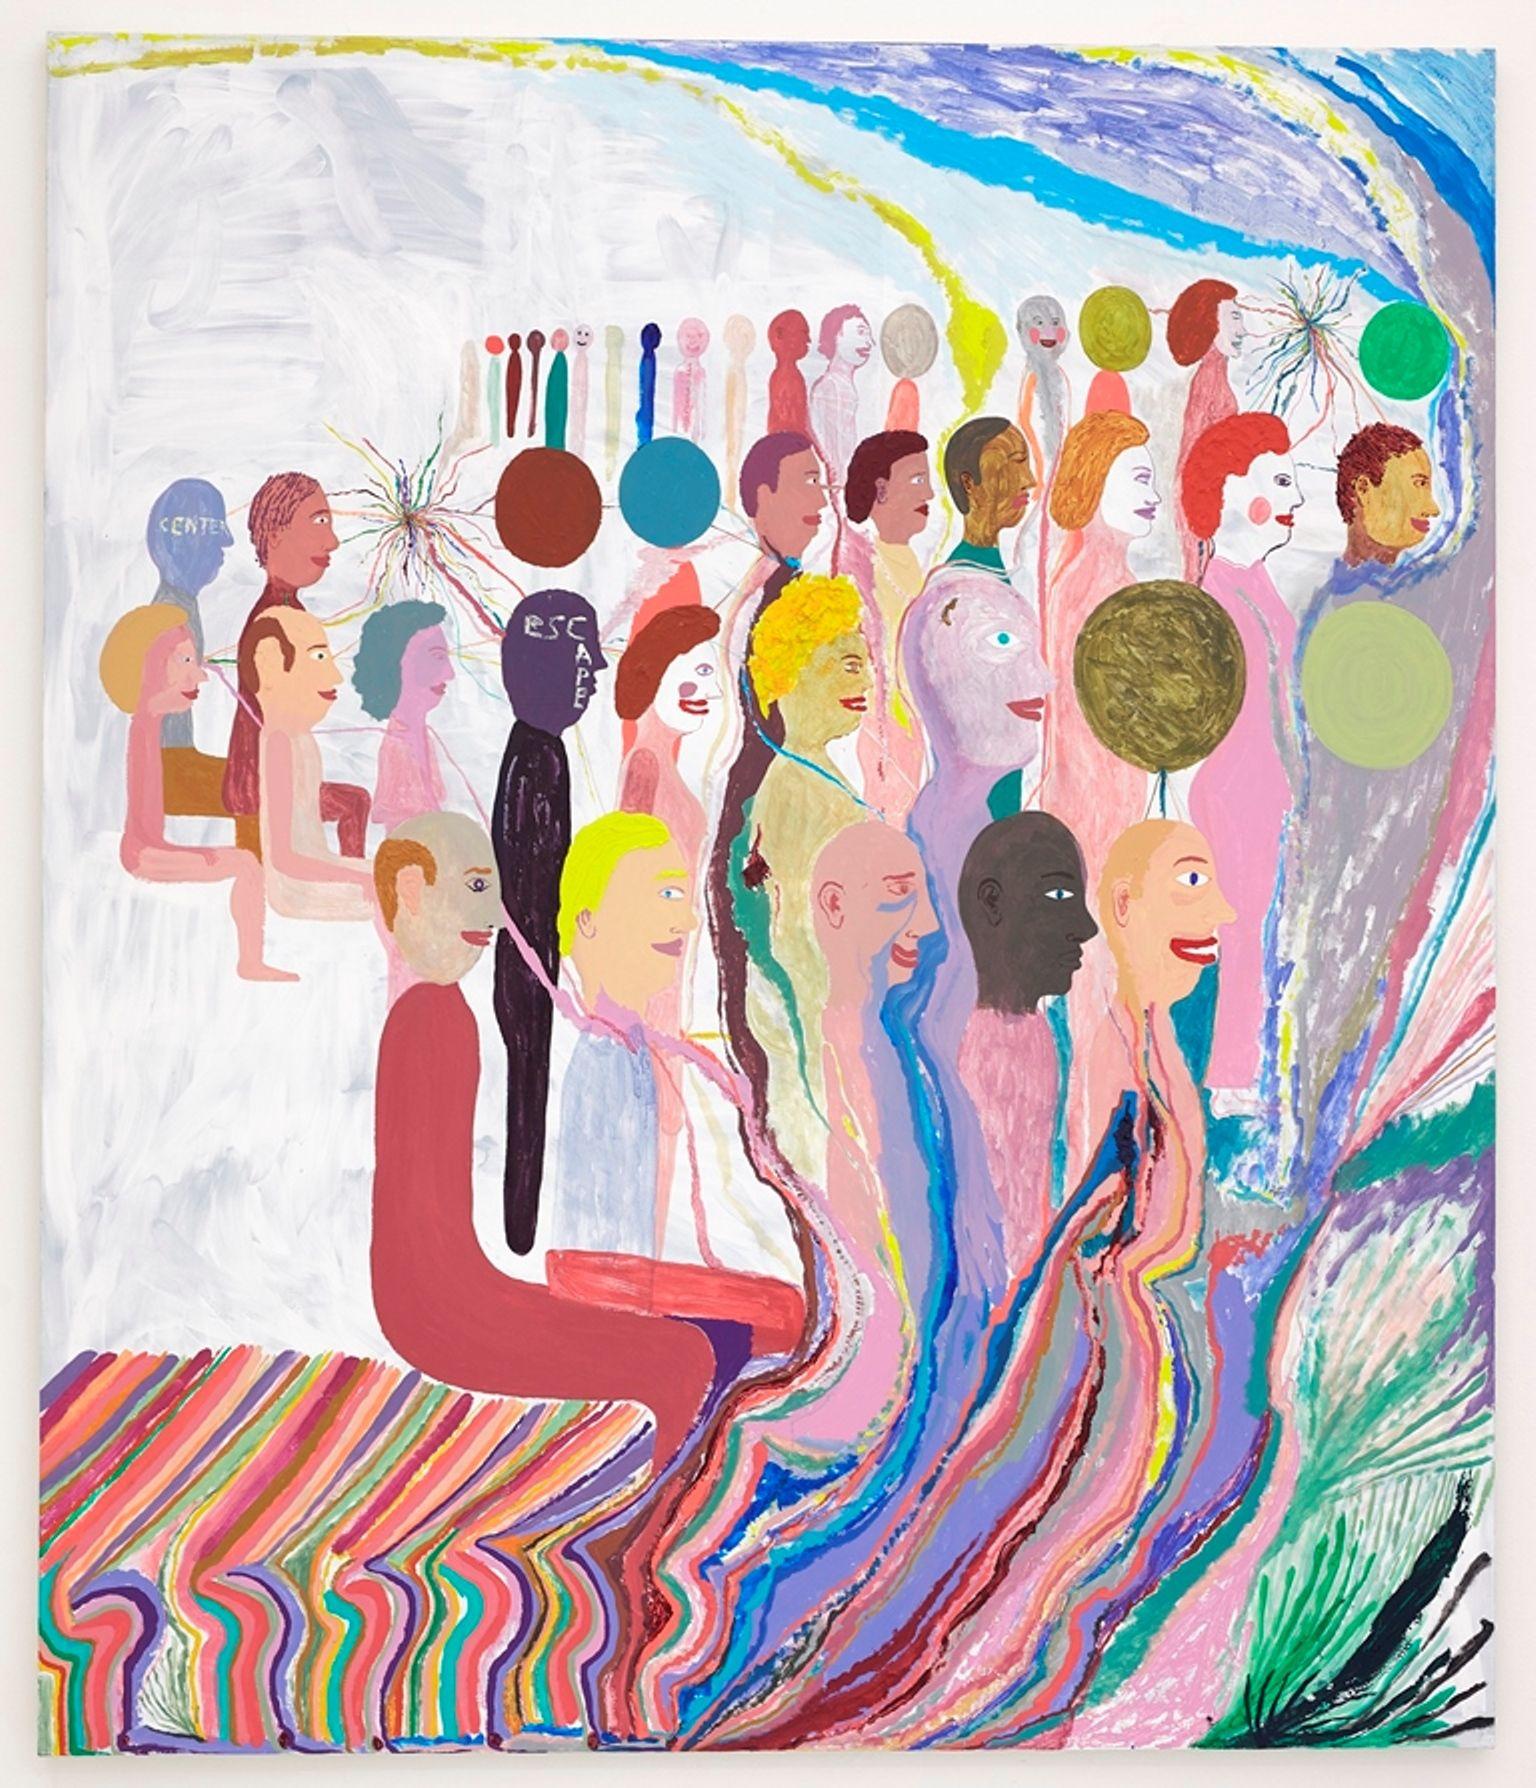 CHRIS JOHANSON Untitled 2018